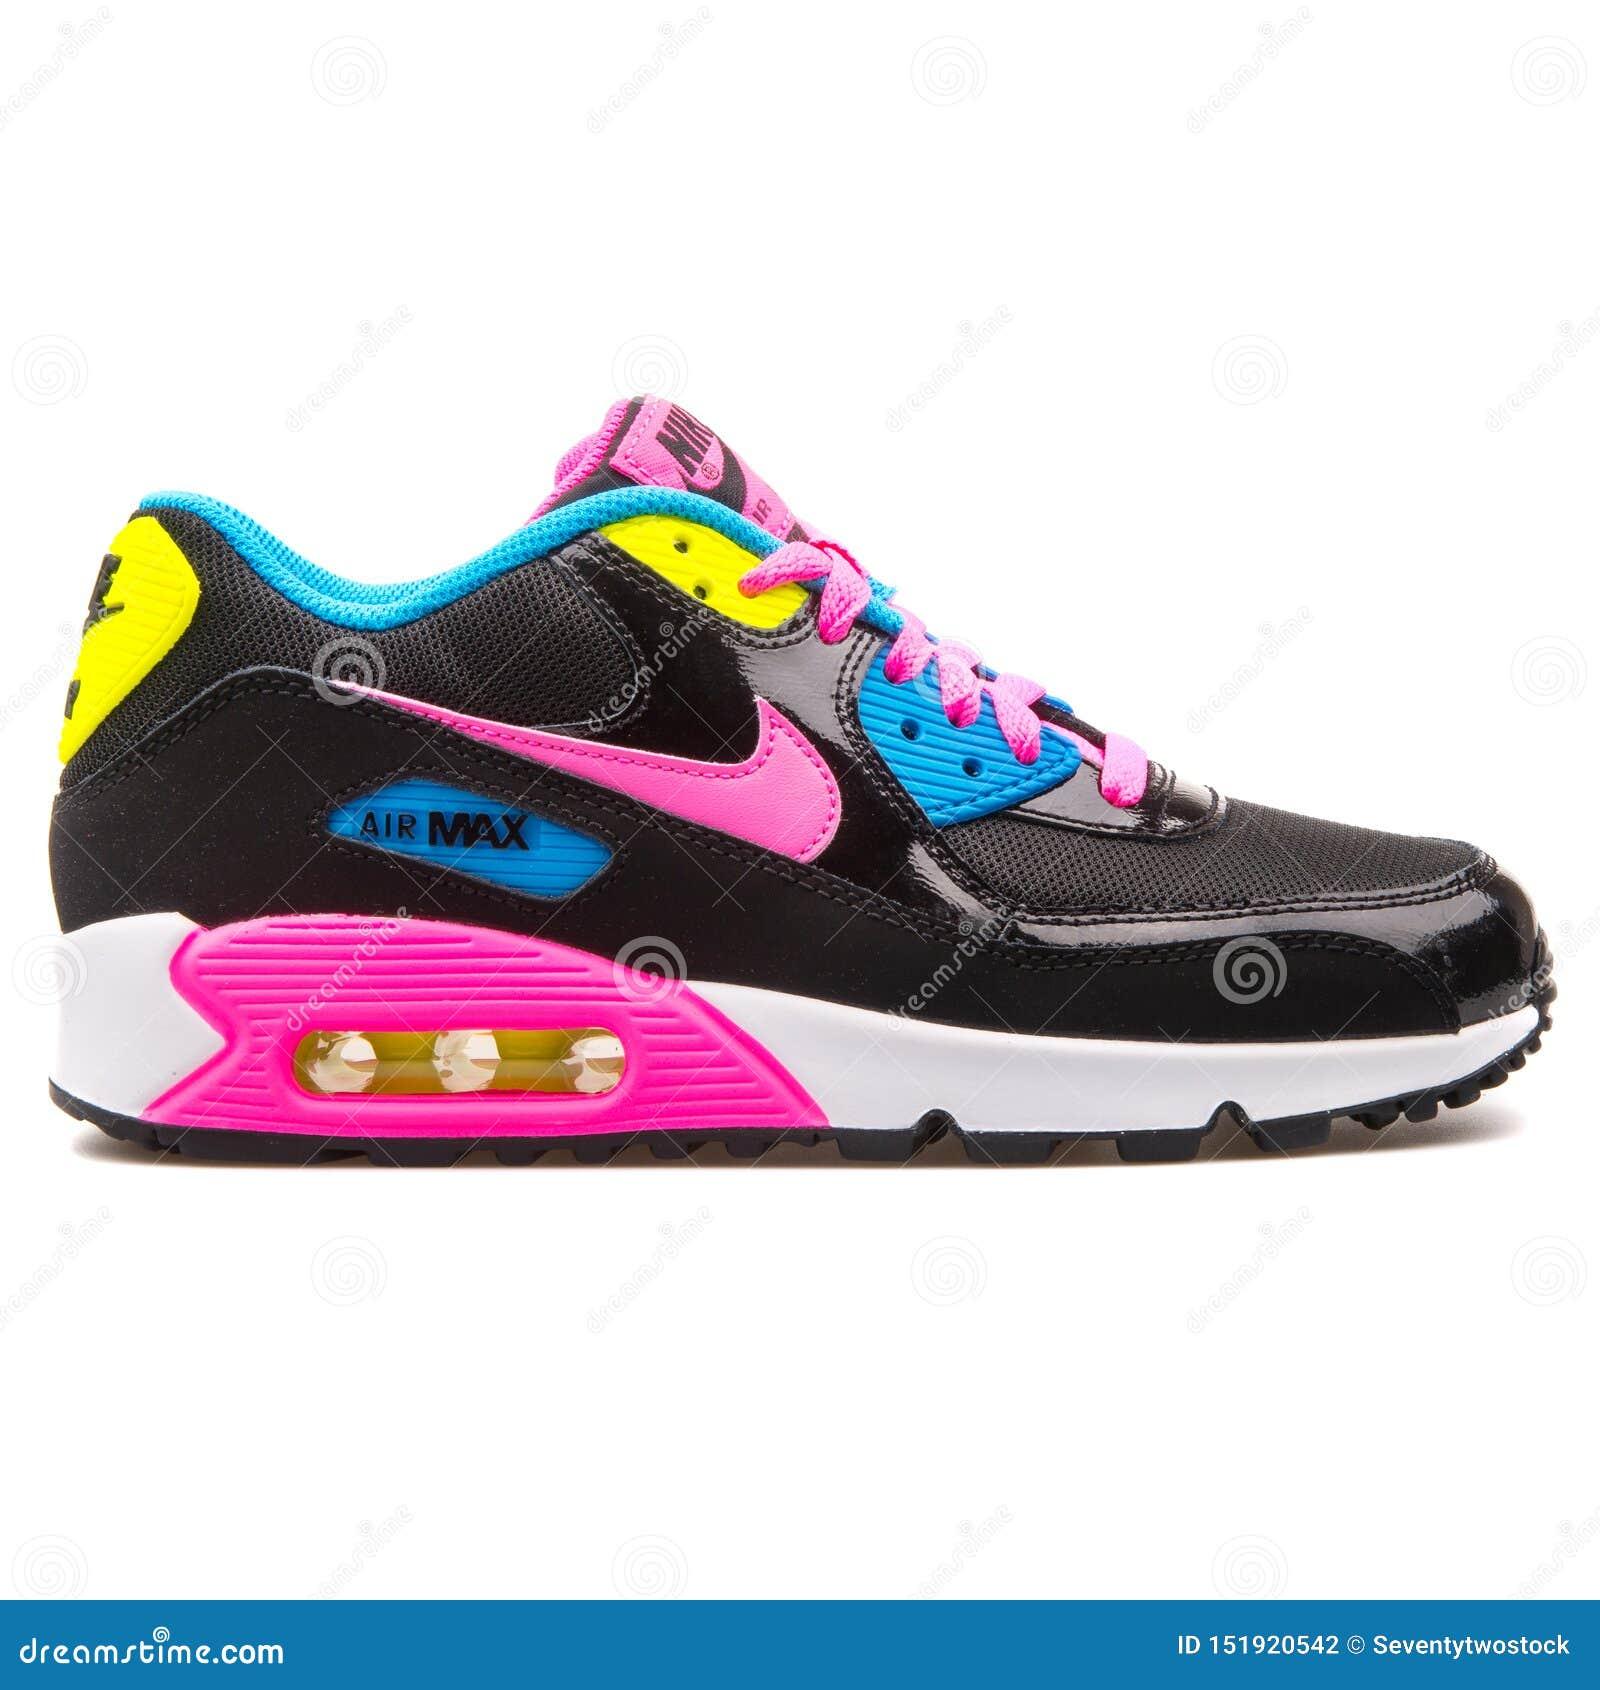 Nike Air Max 90 Mesh Black, Pink, Blue And Yellow Sneaker